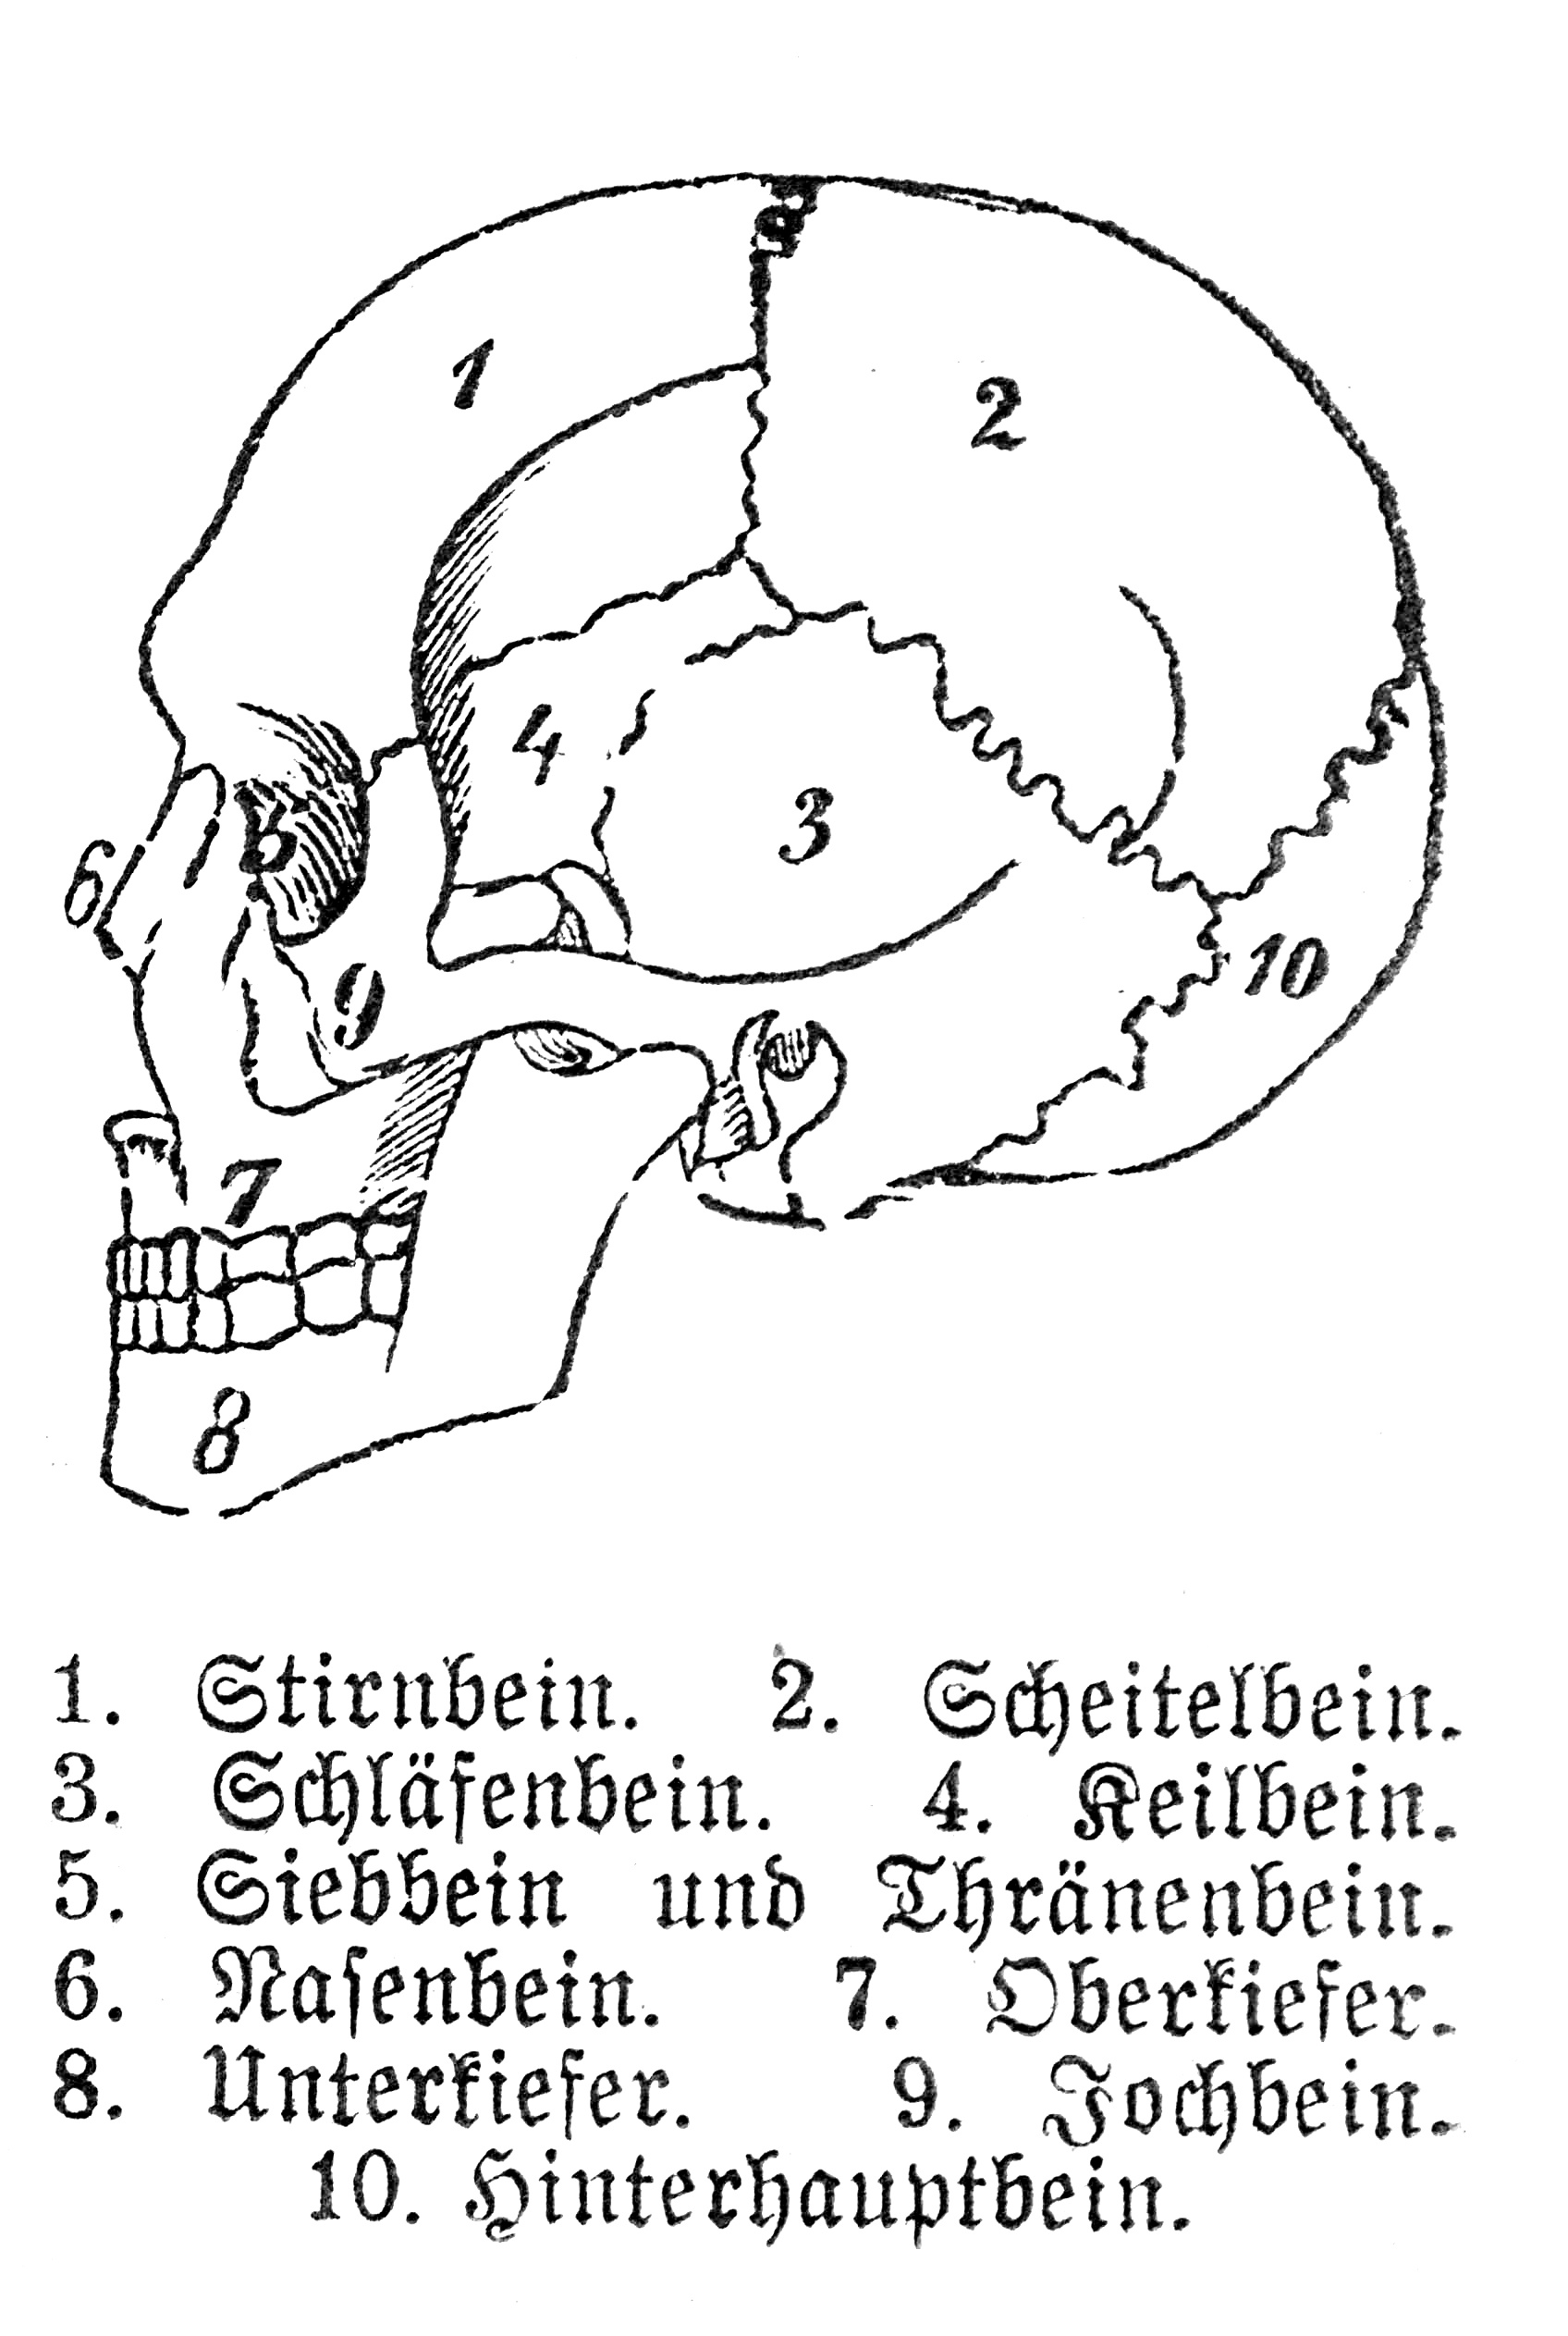 File:Human skull with german legend.jpg - Wikimedia Commons